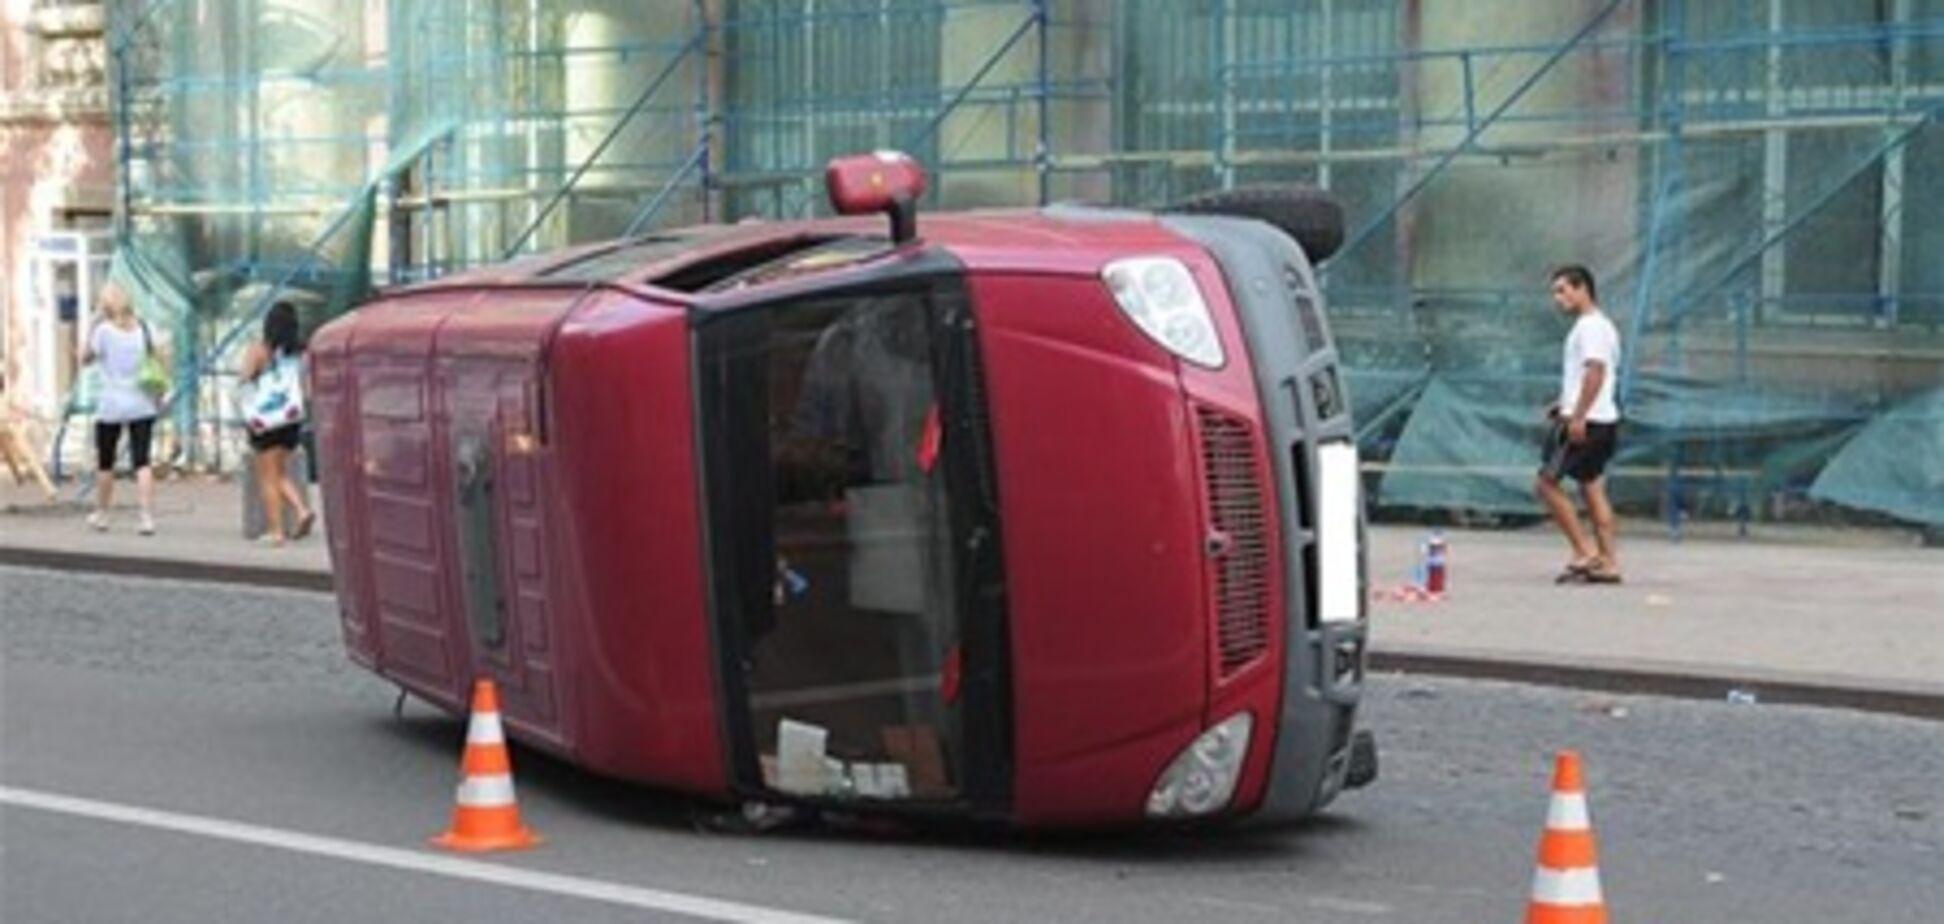 Kia Sportage швырнула 'Газель' прямо в пешеходов на «зебре»